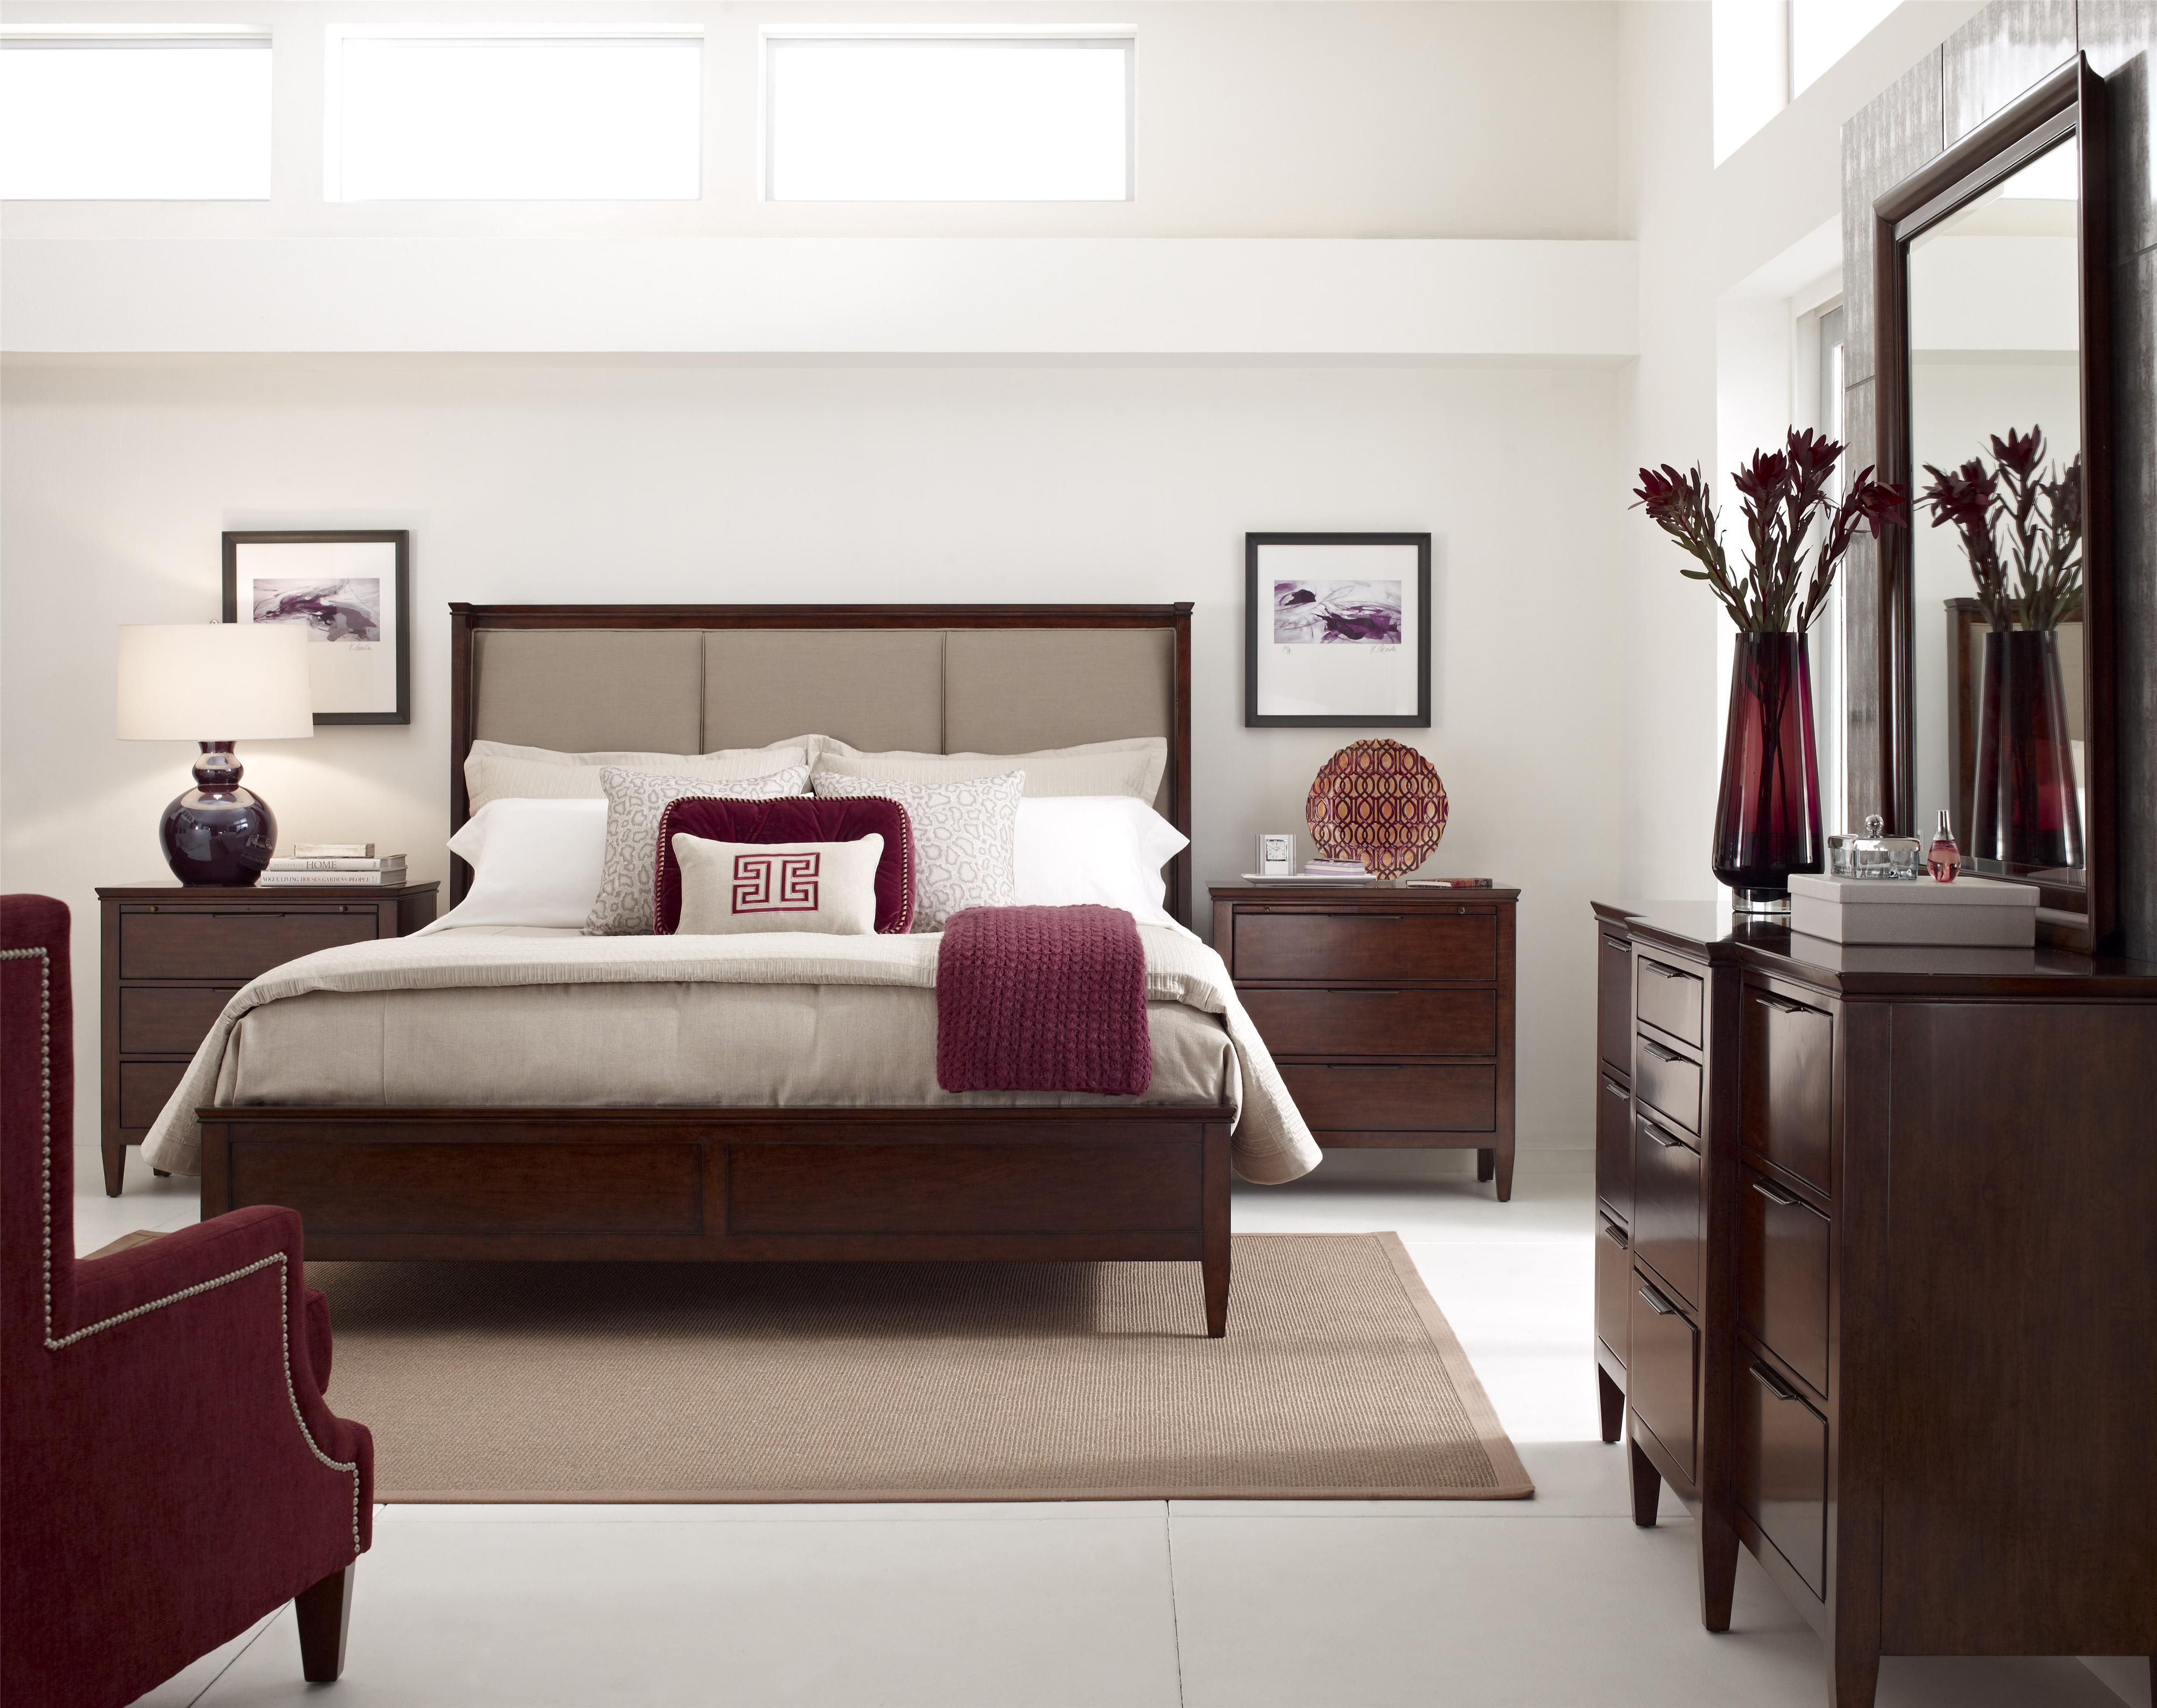 kincaid furniture elise spectrum queen upholstered bed in mushroom